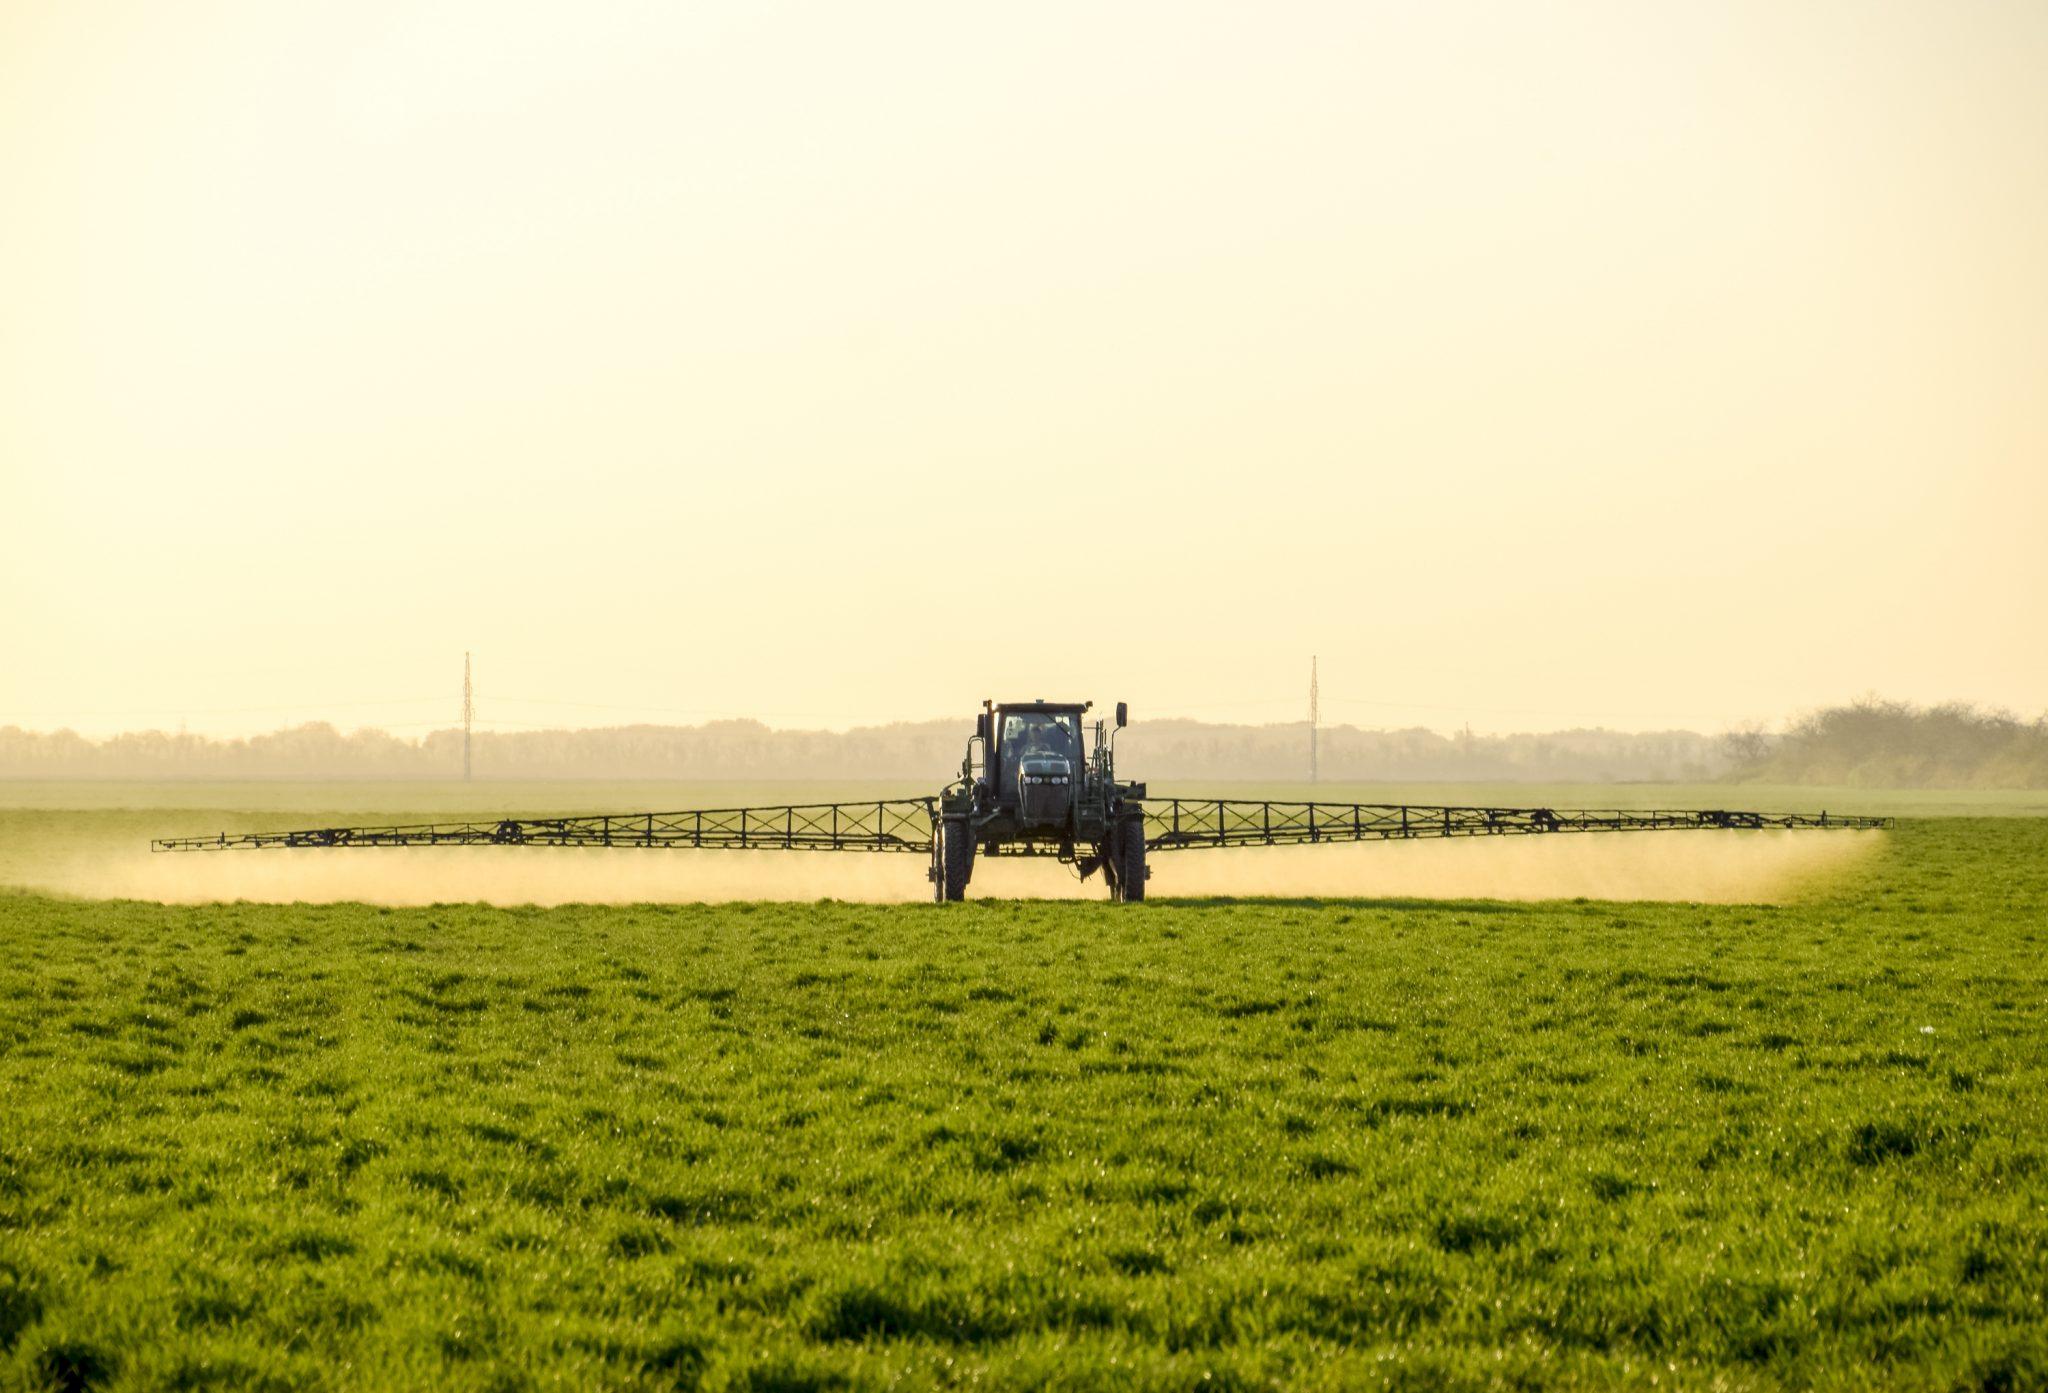 A John Deere sprayer applying nitrogen fertilizer. Image by shutterstock.com/Leonid Eremeychuk